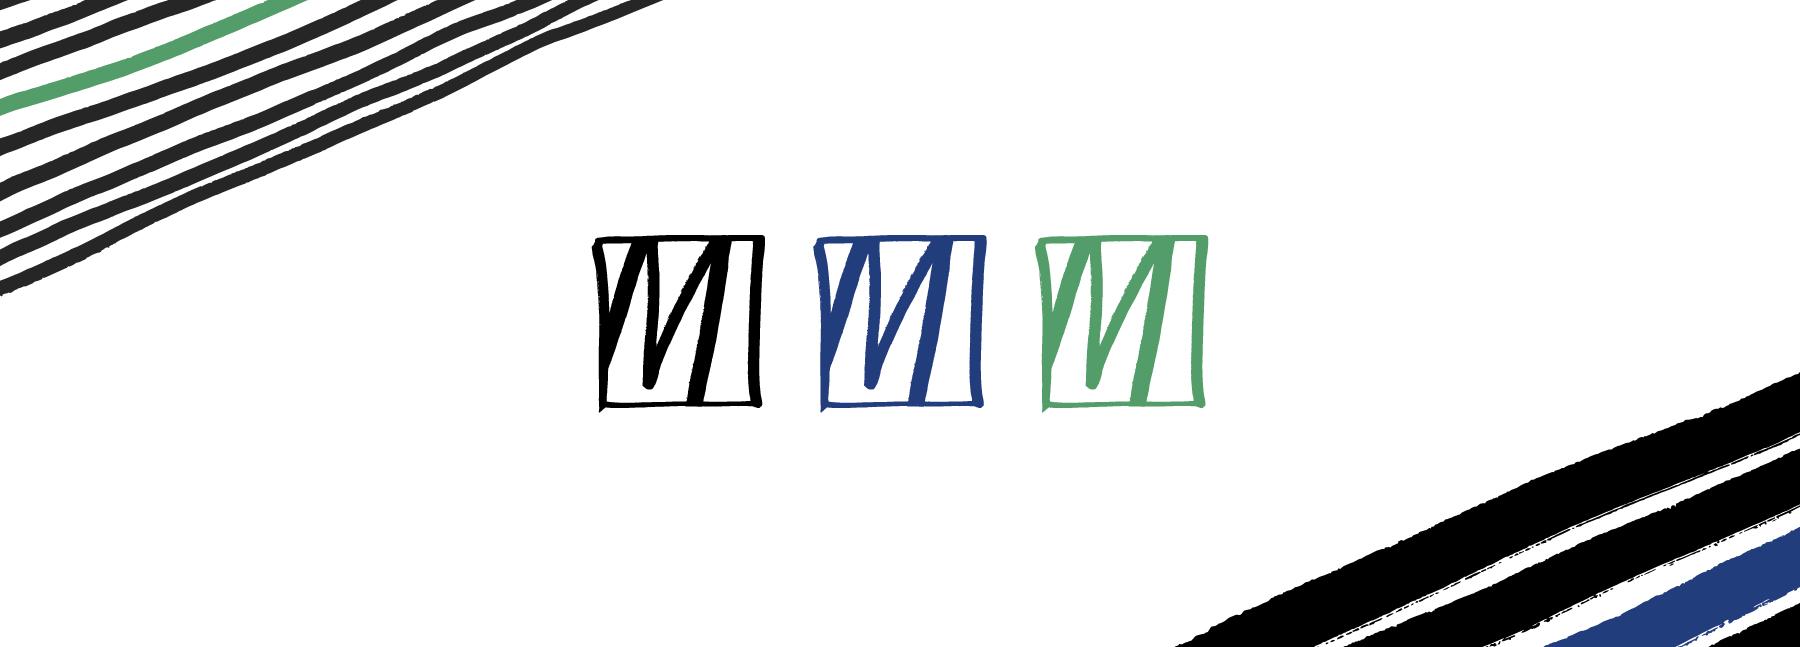 Muse-Secondary-Marks.jpg